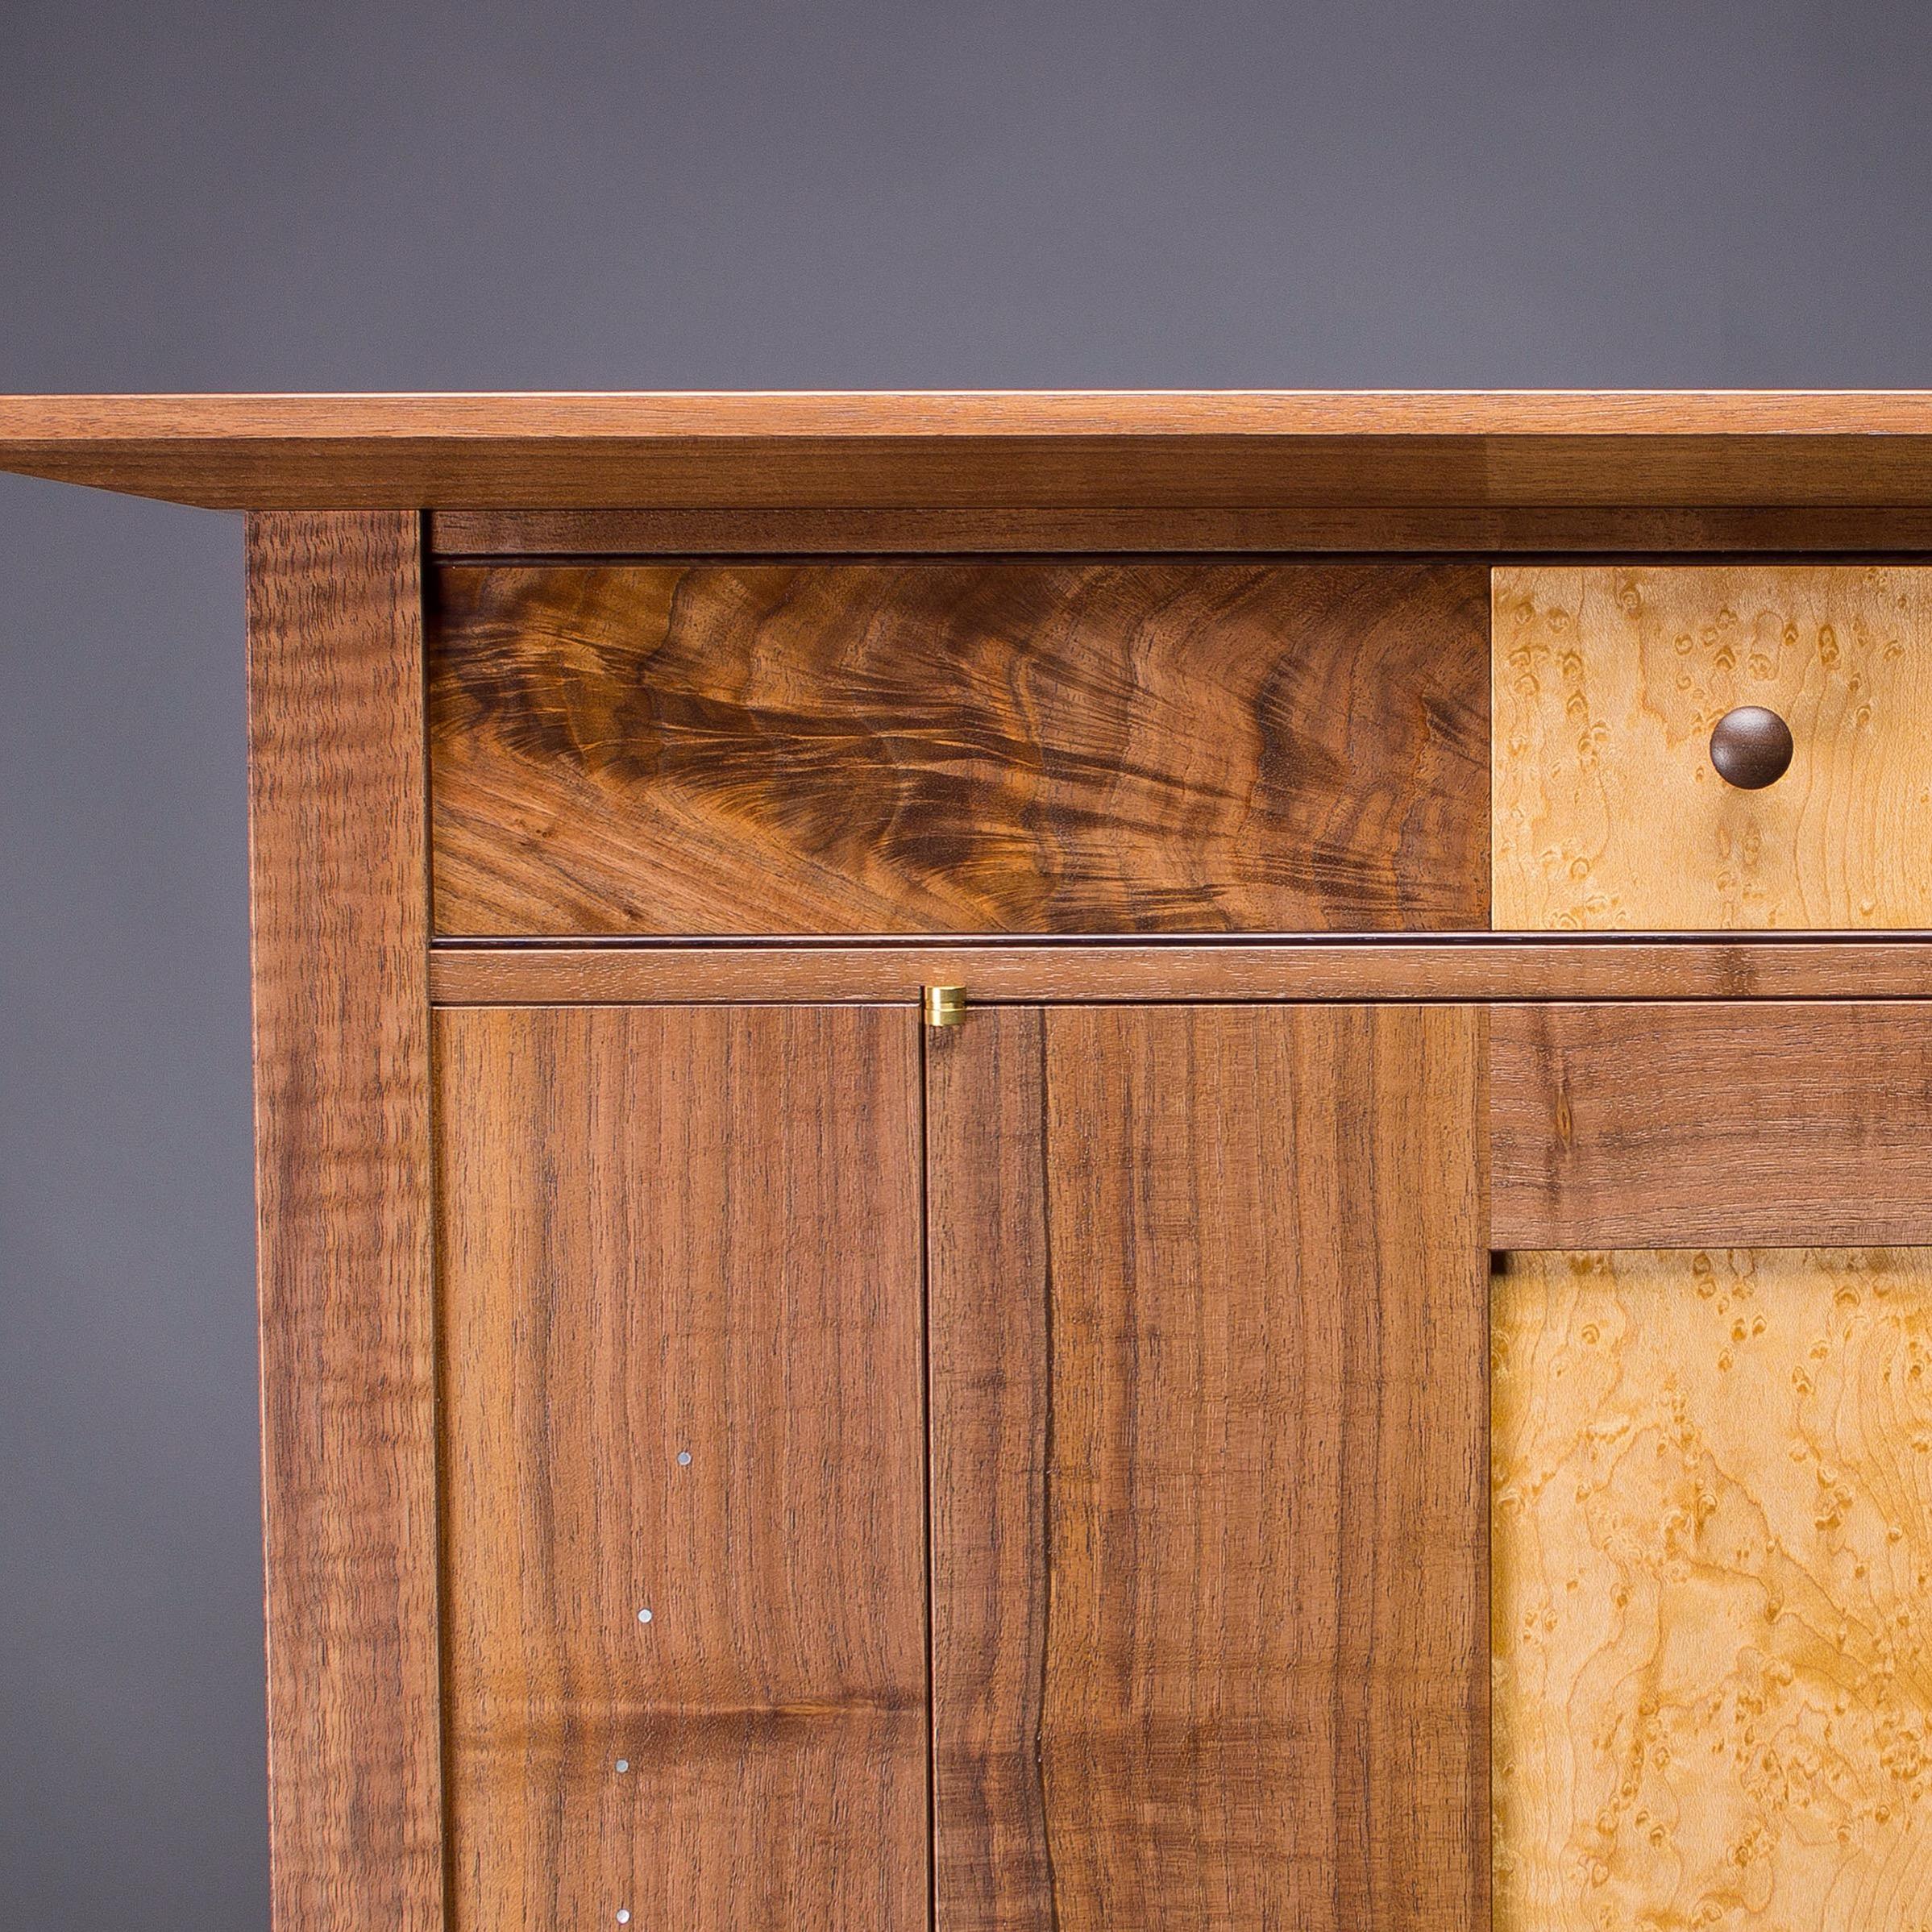 art furniture case on stand.JPG